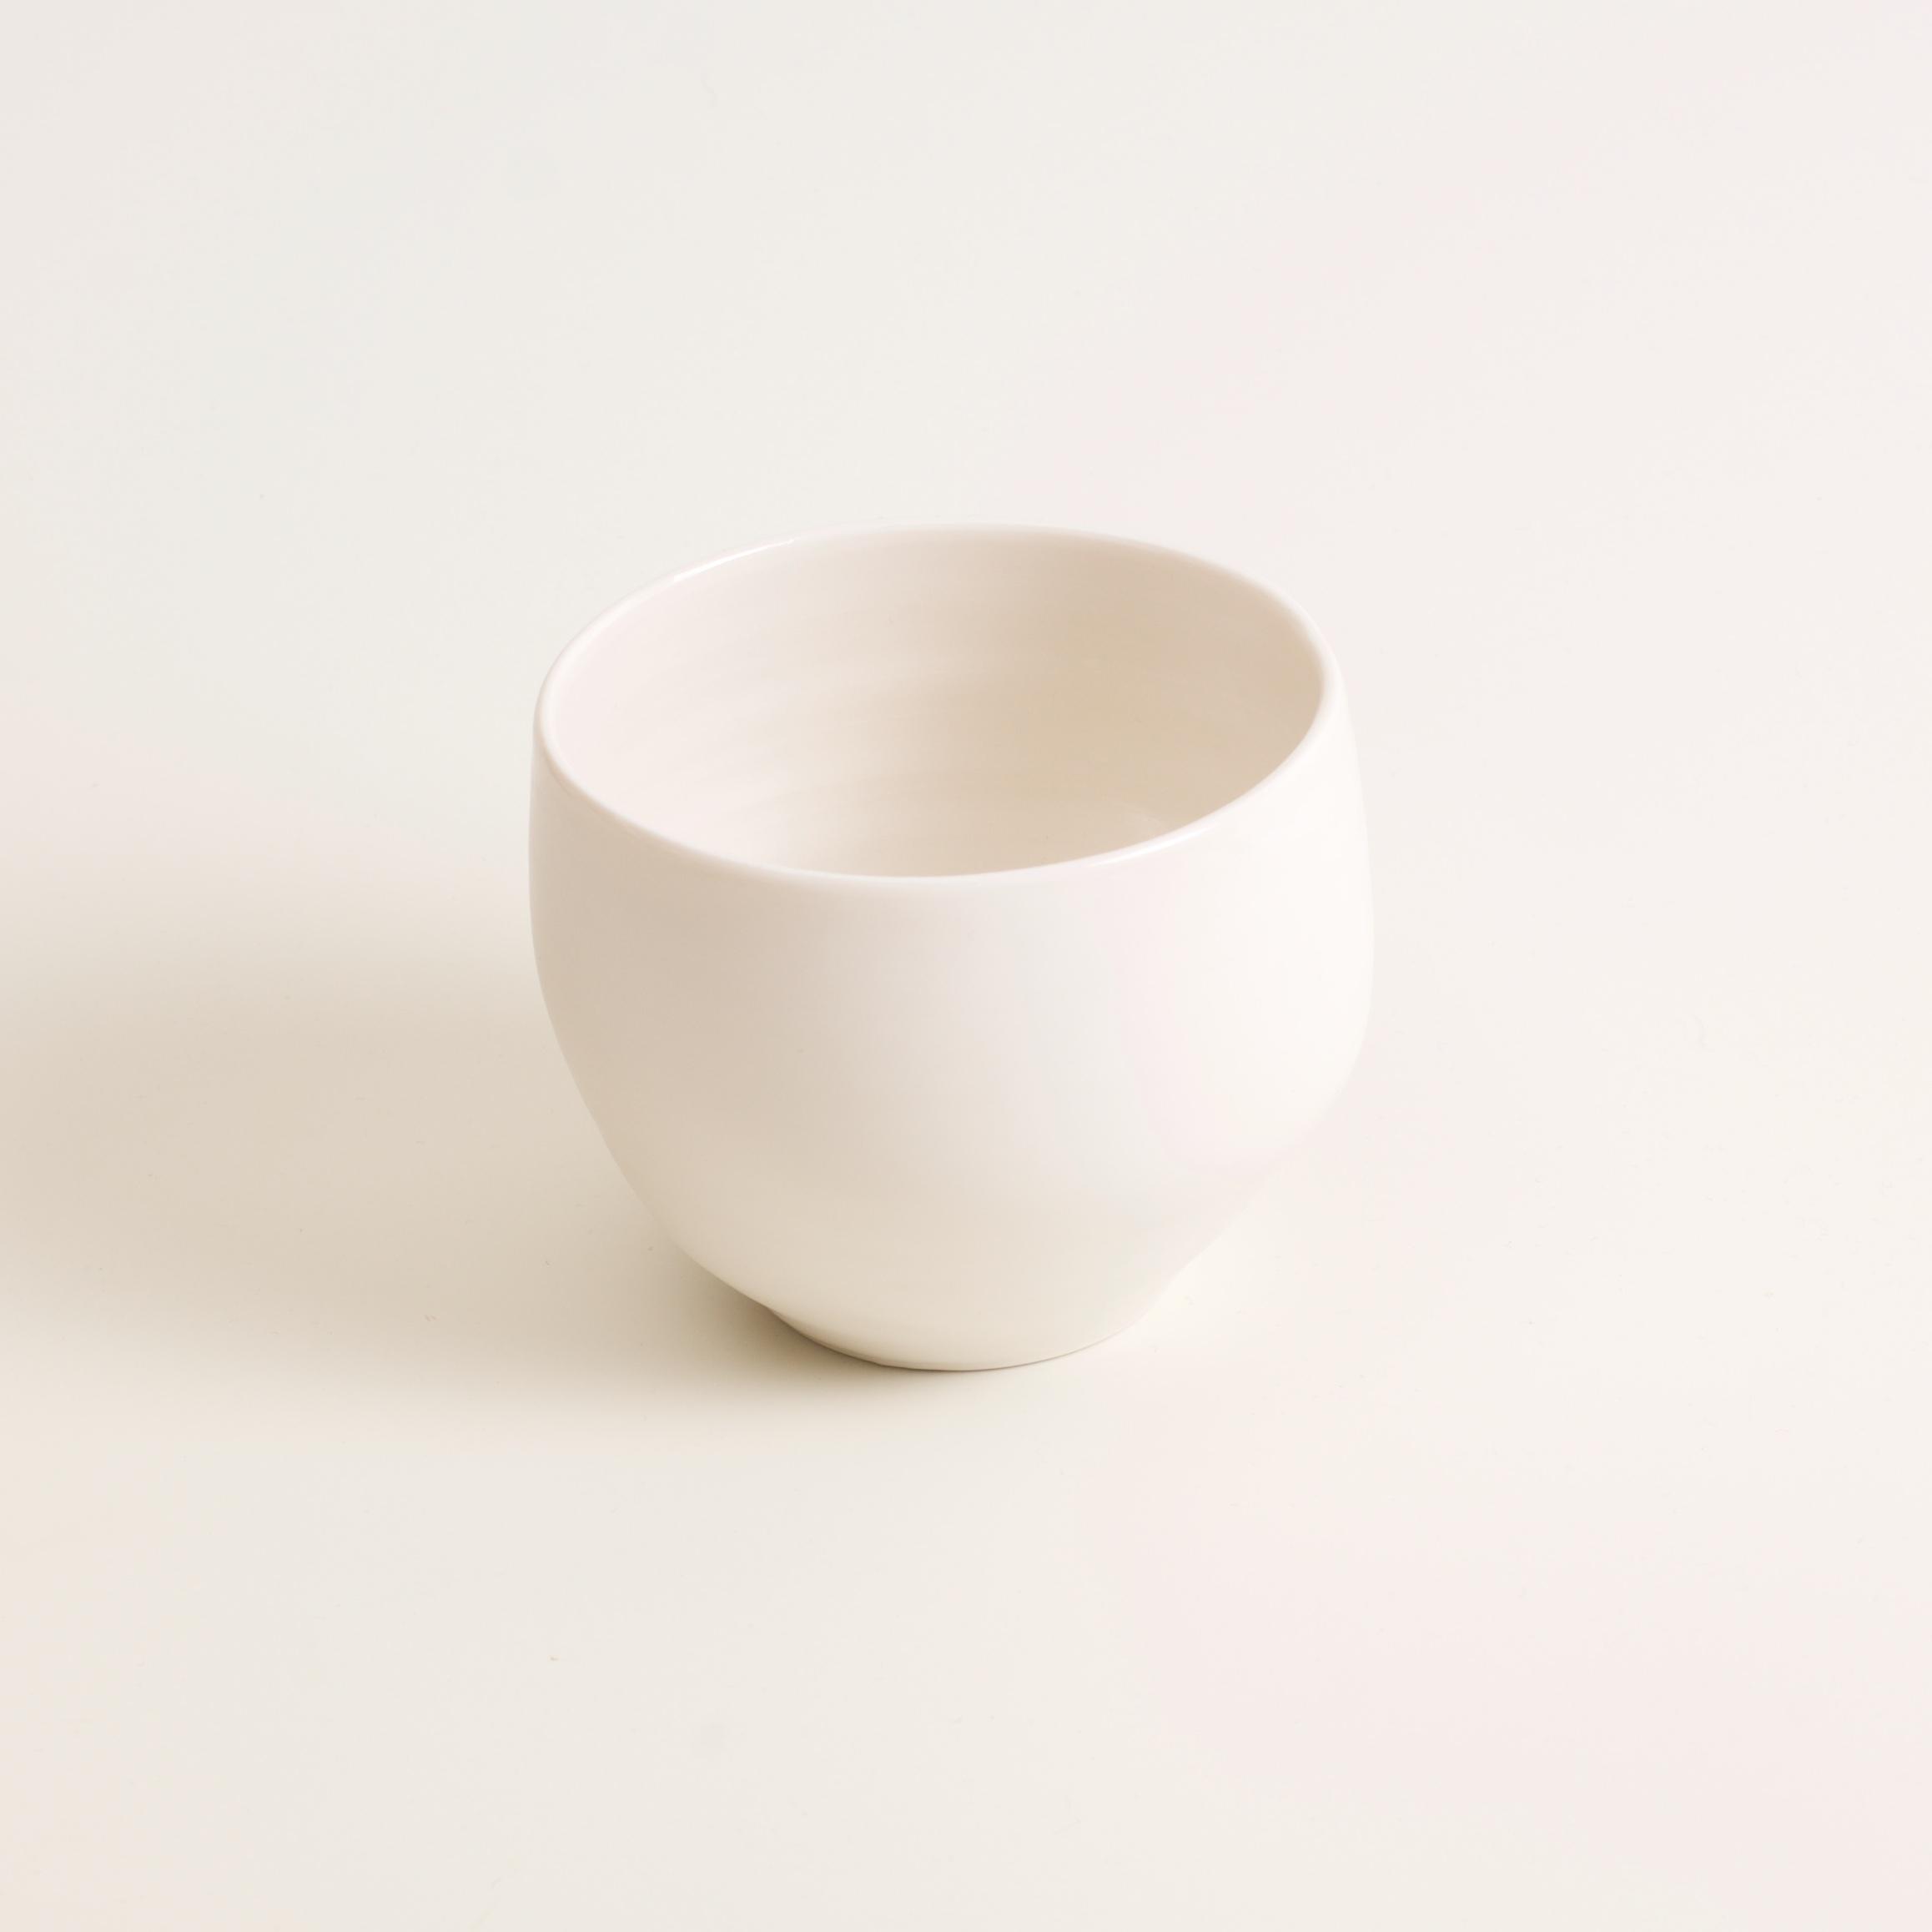 Linda Bloomfield- tea bowl- handmade porcelain